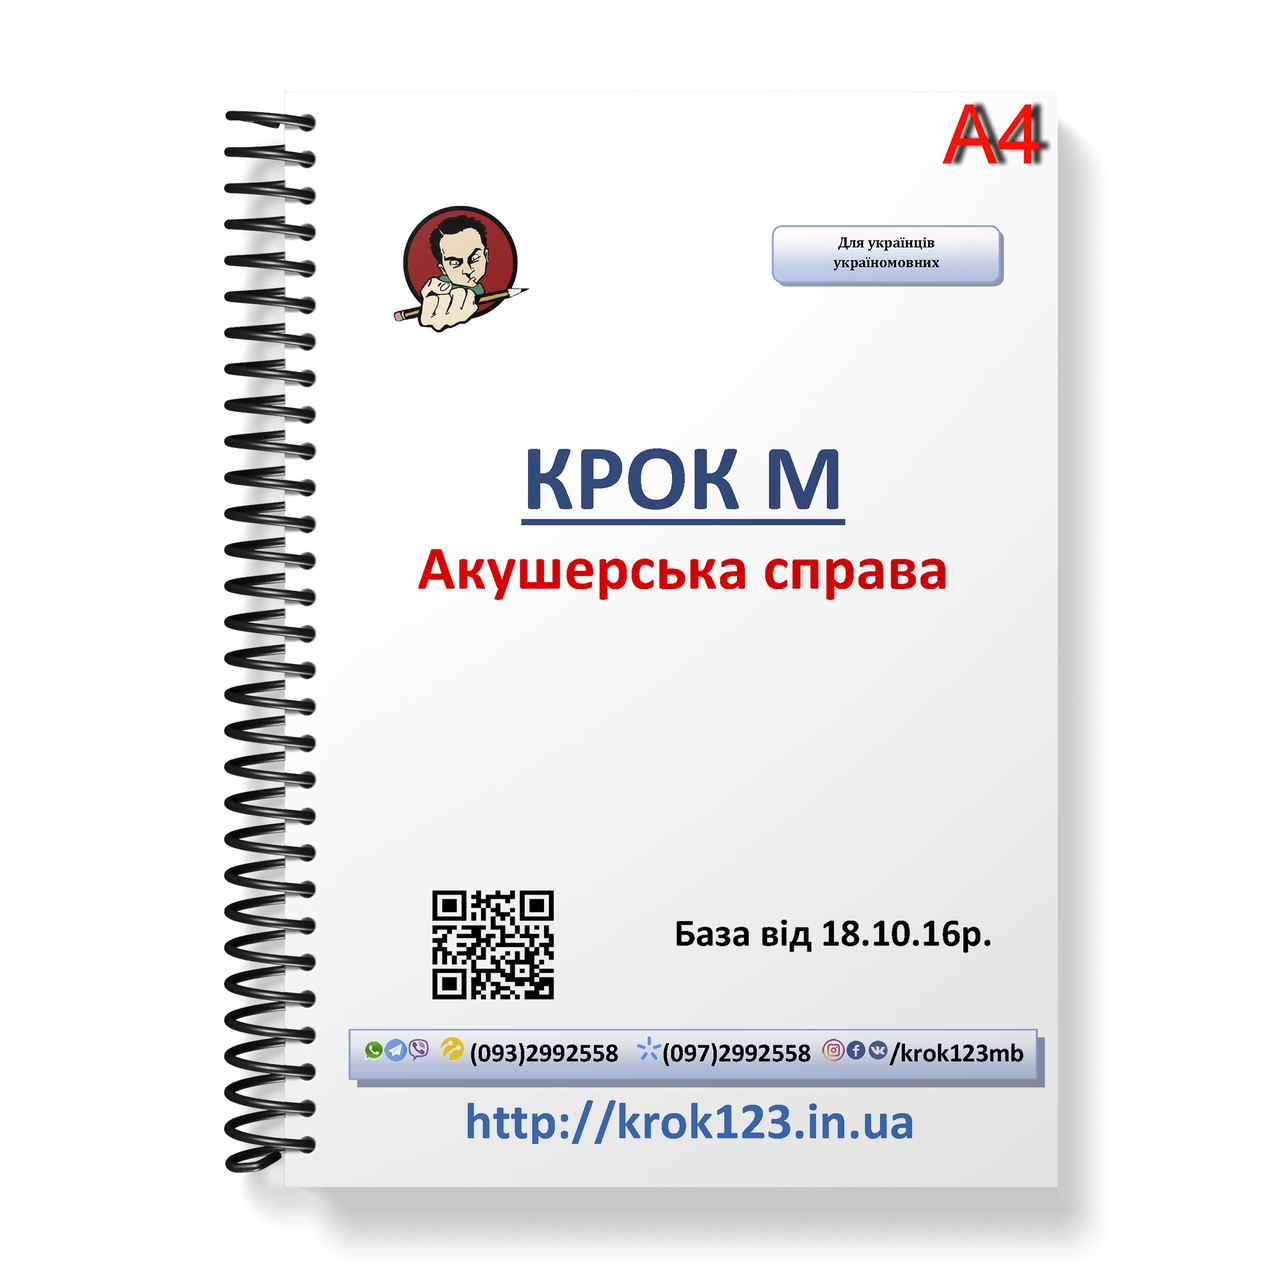 Крок М. Акушерское дело. База від 18.10.2016 року. Для украинцев украиноязычных. Формат А4